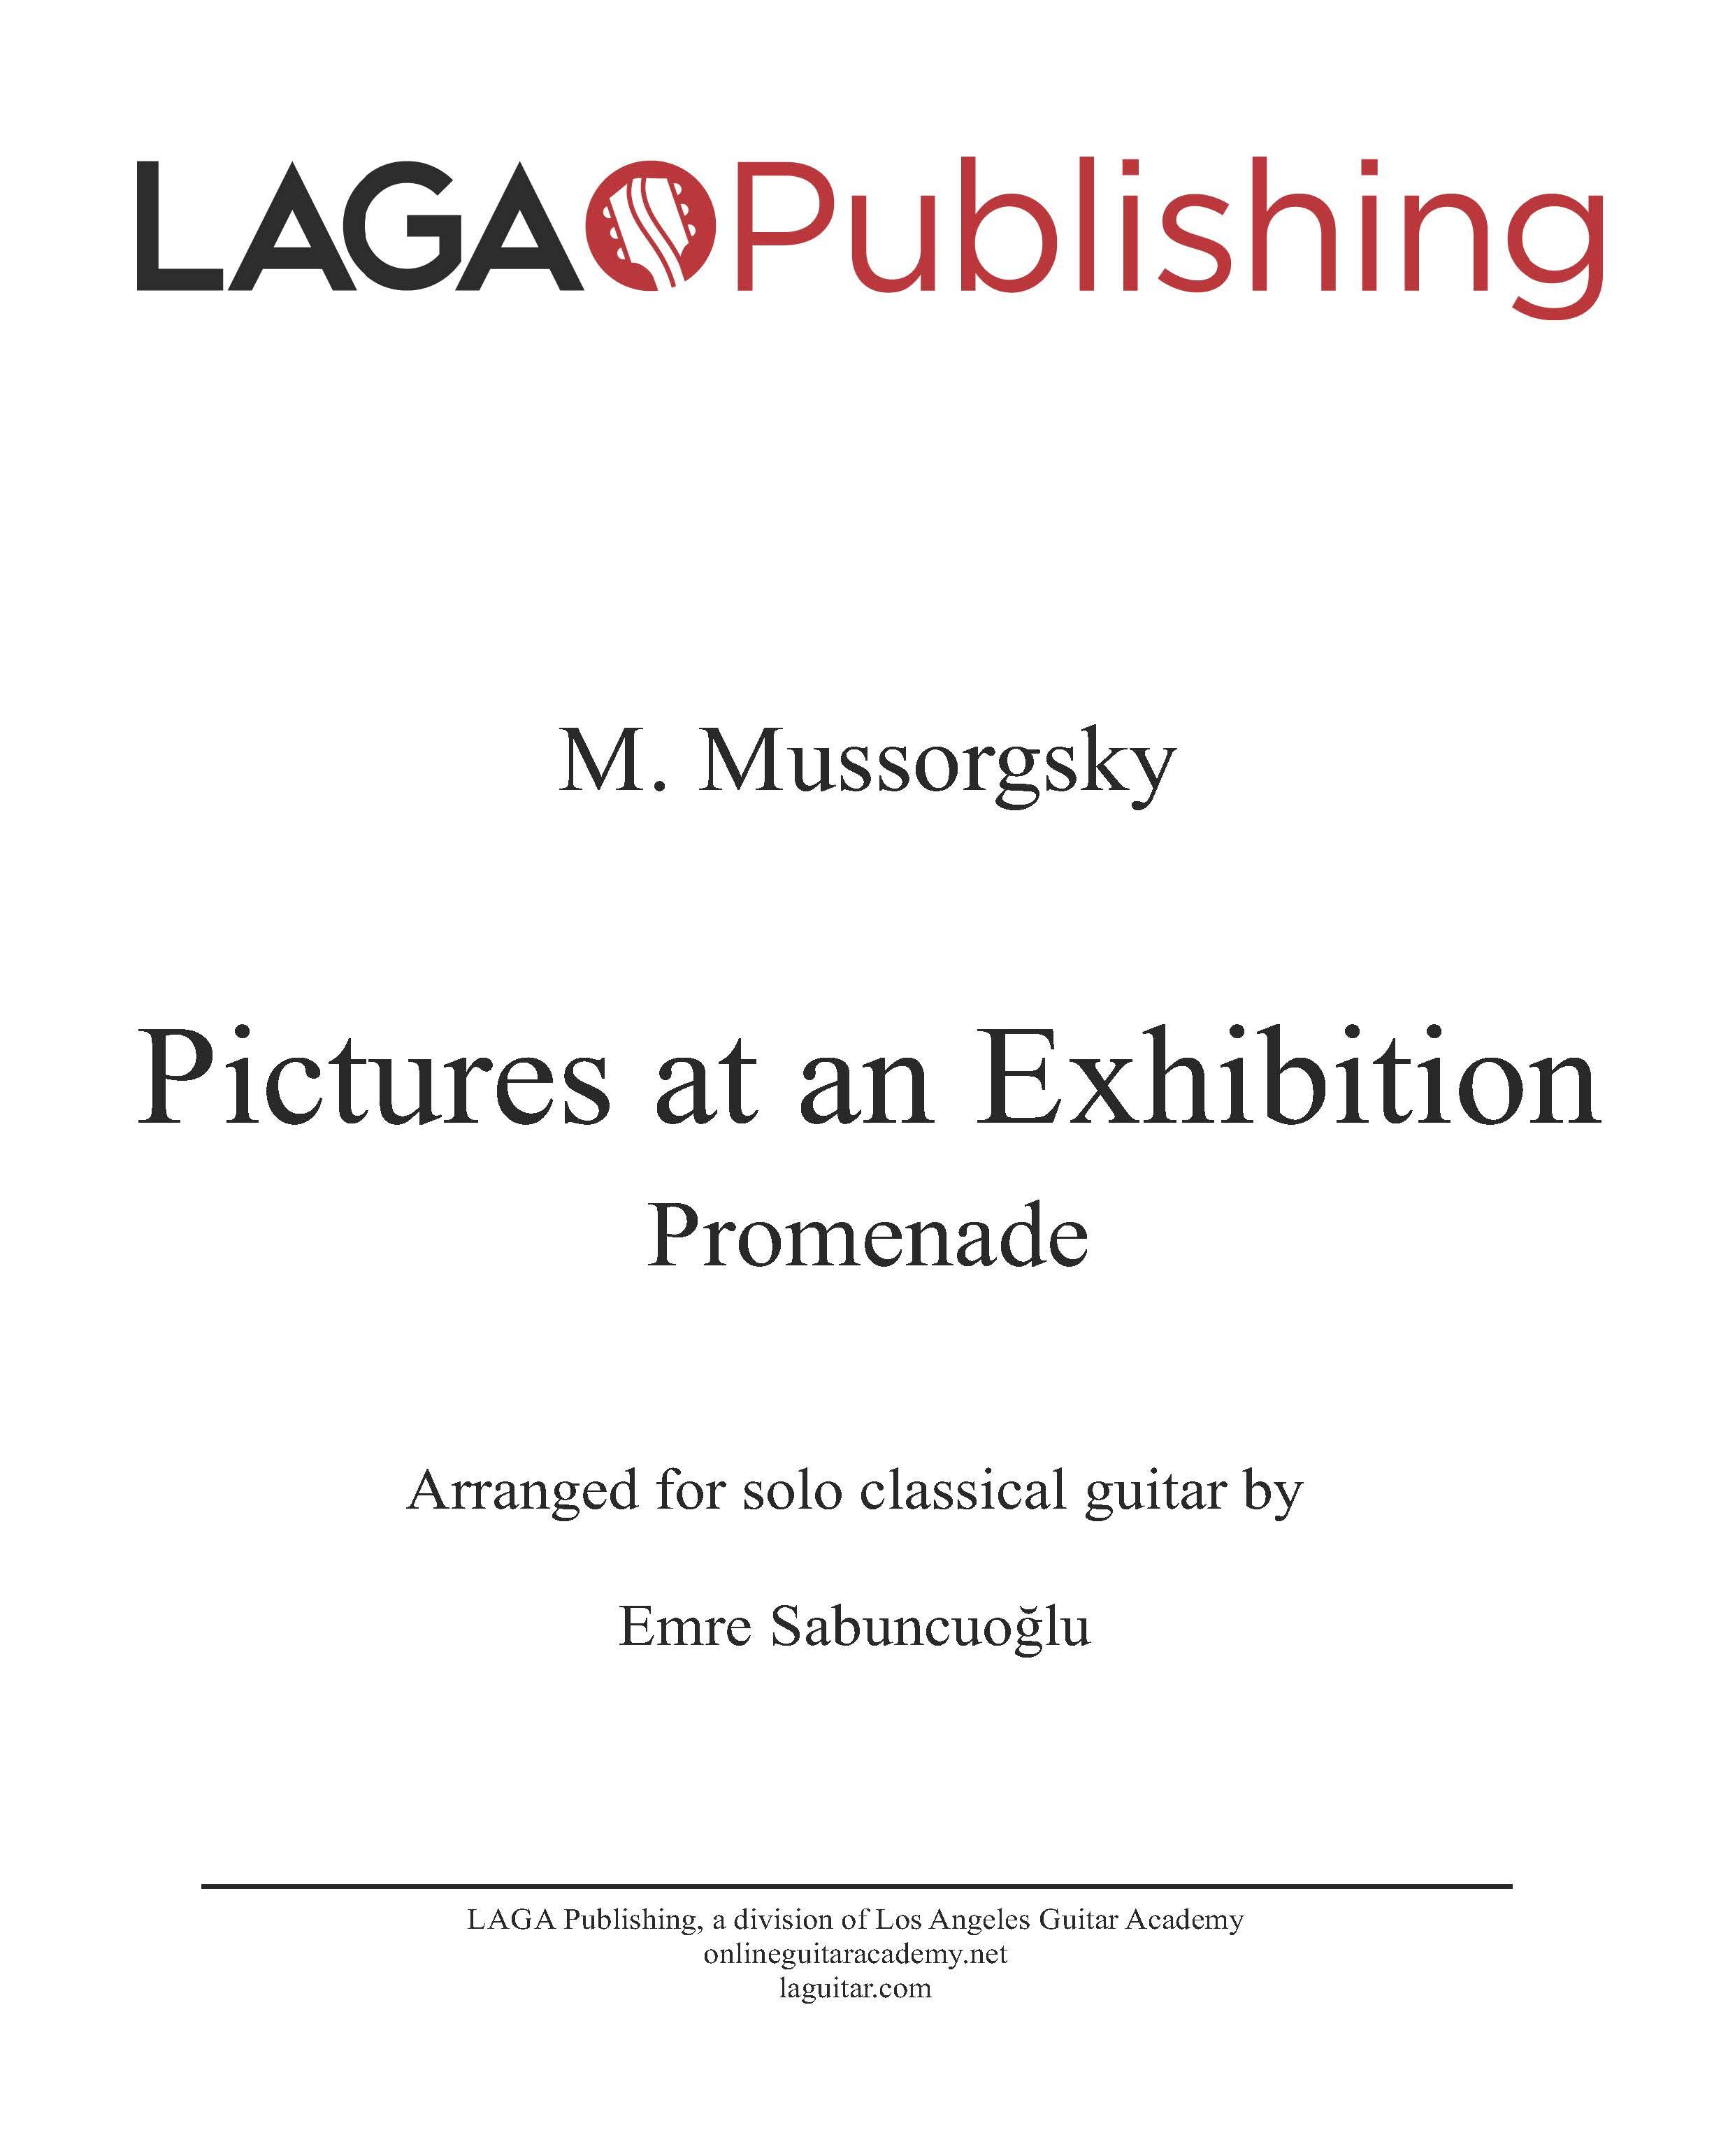 LAGA-Publishing-Mussorgsky-Promenade-Score-and-Tab